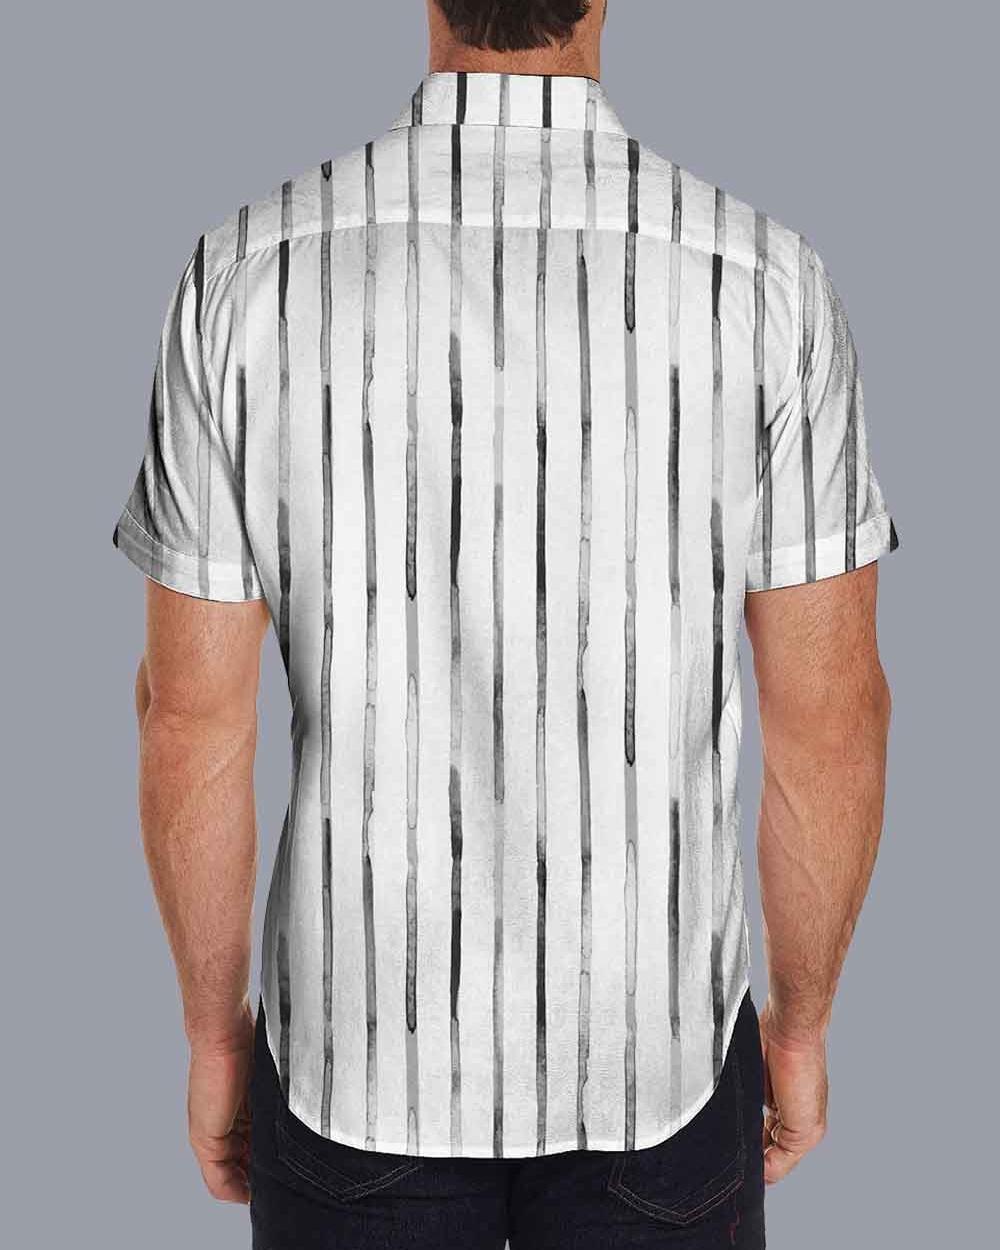 junctionstore|ravirajoria/mensshirt/greyjunctionstore|ravirajoria/mensshirt/grey